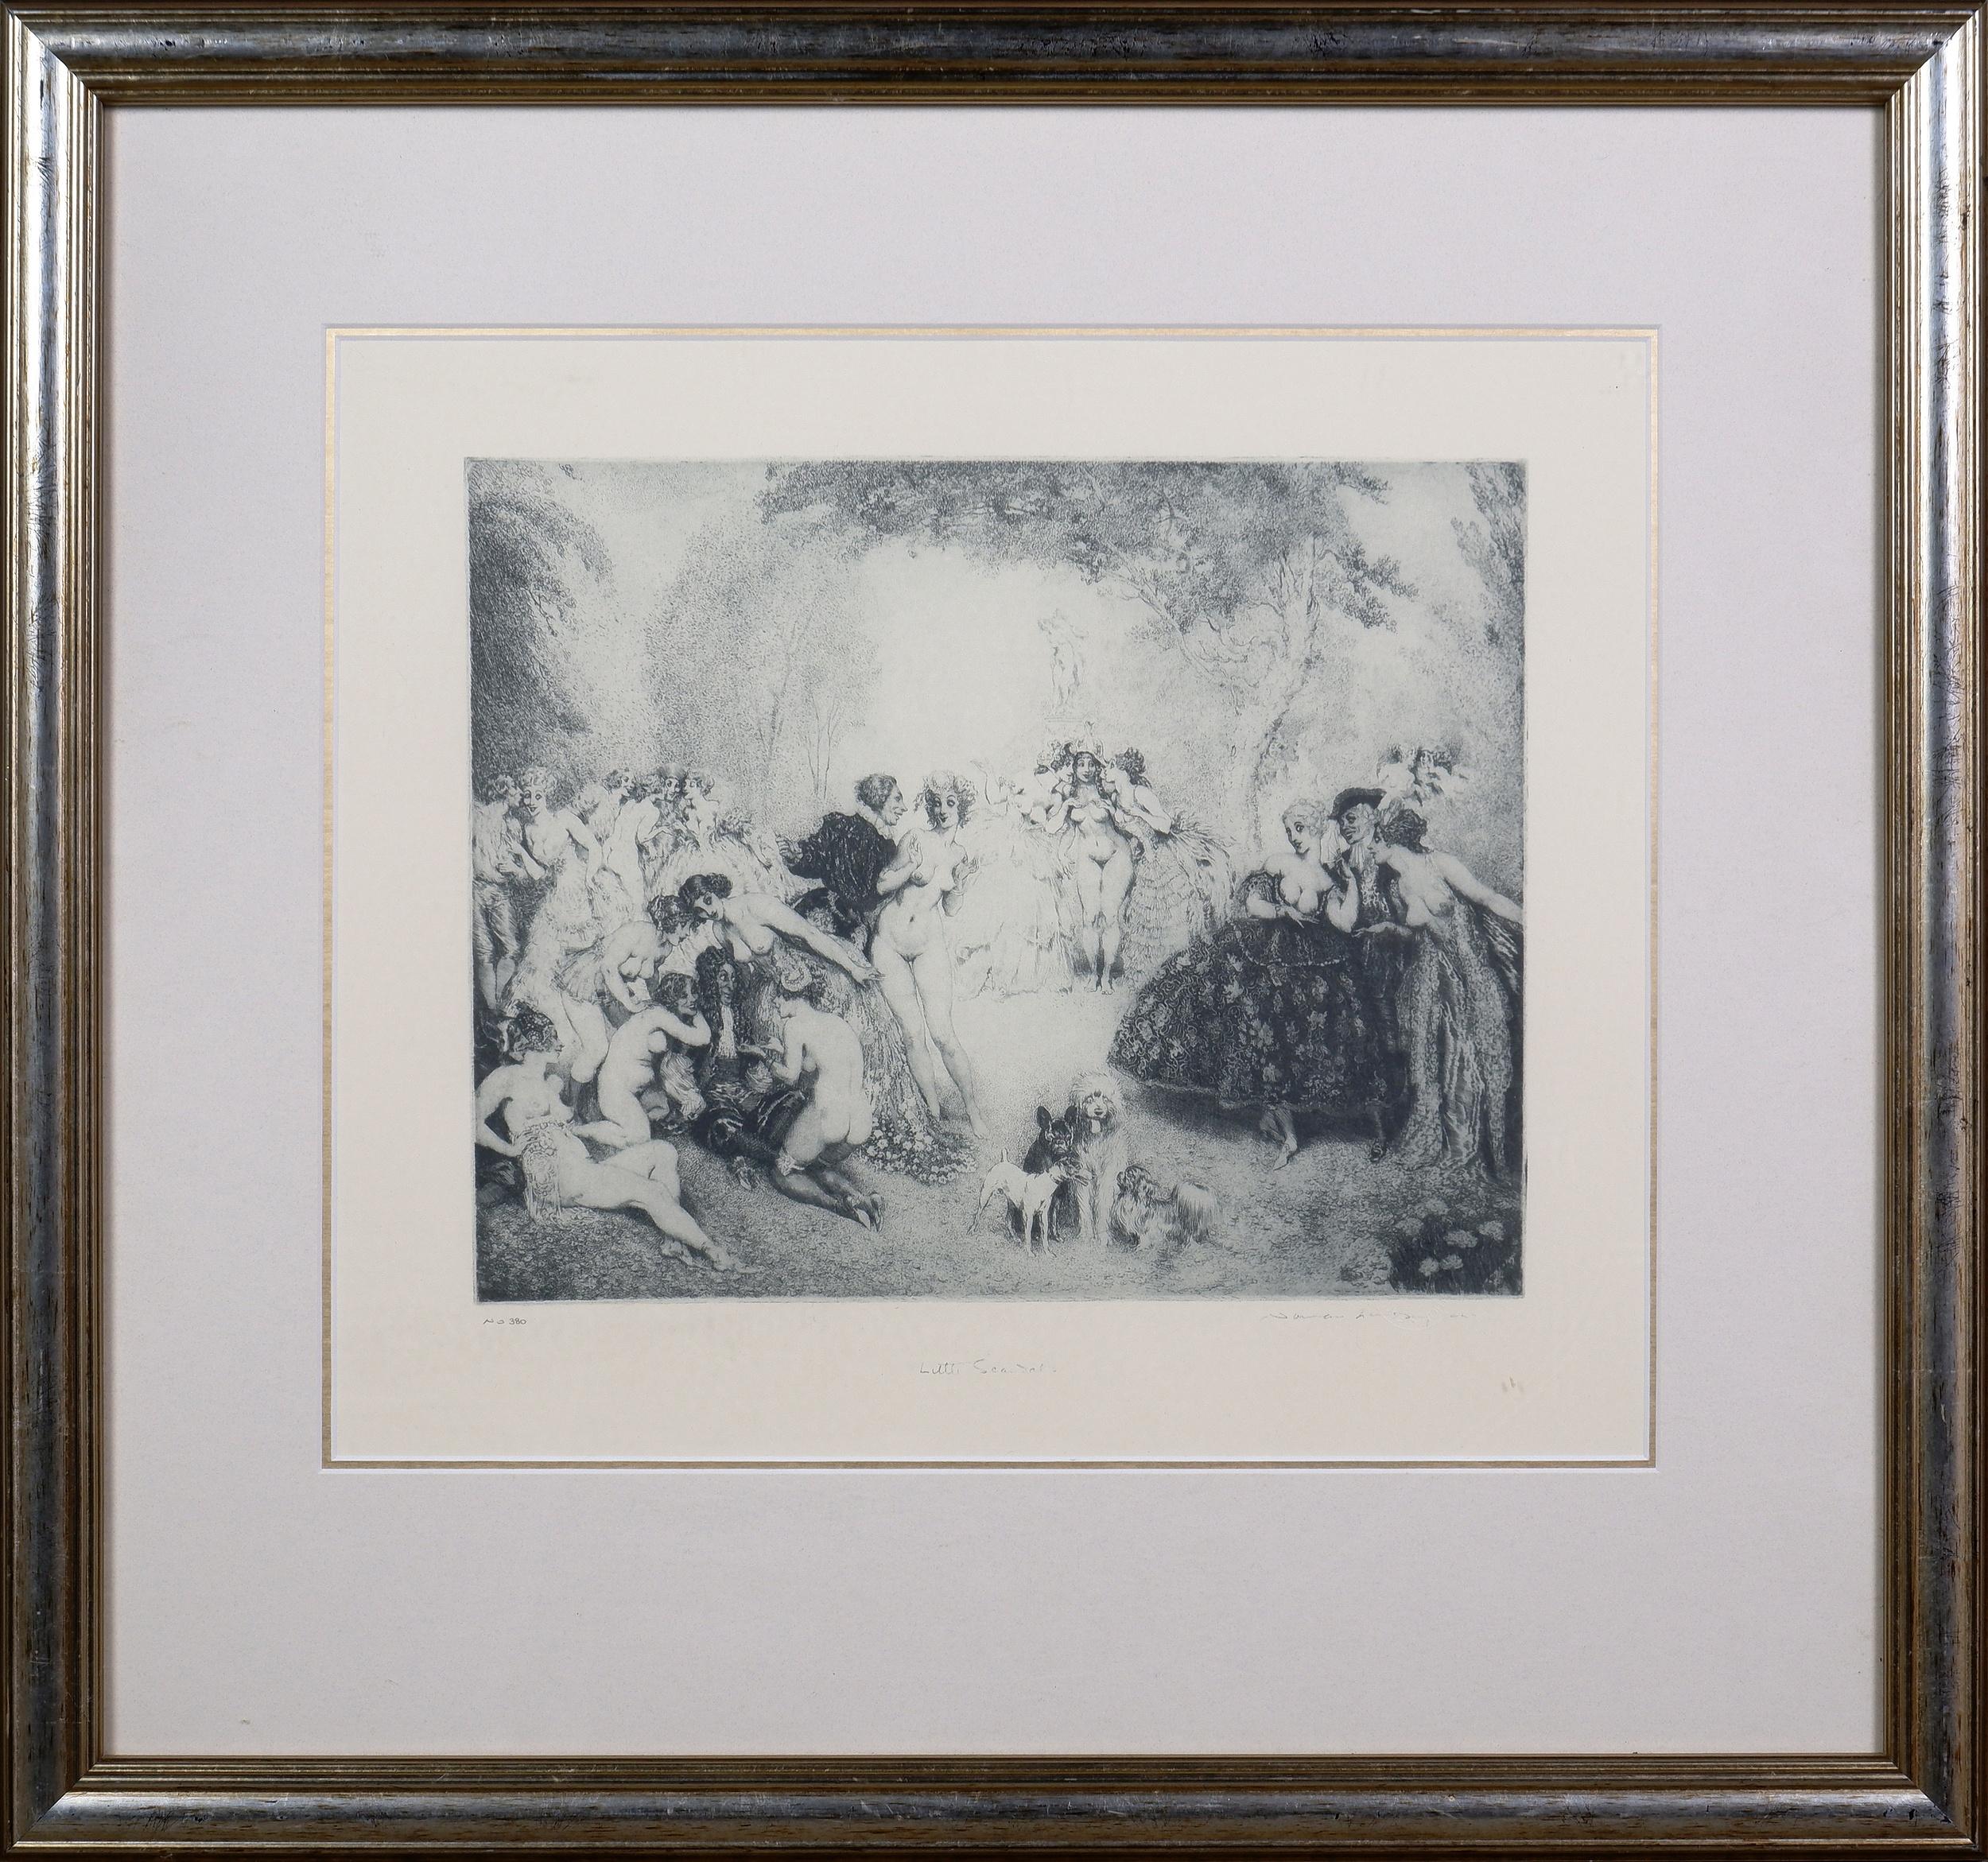 'Norman Lindsay (1879-1969), Little Scandals, Facsimilie Etching'